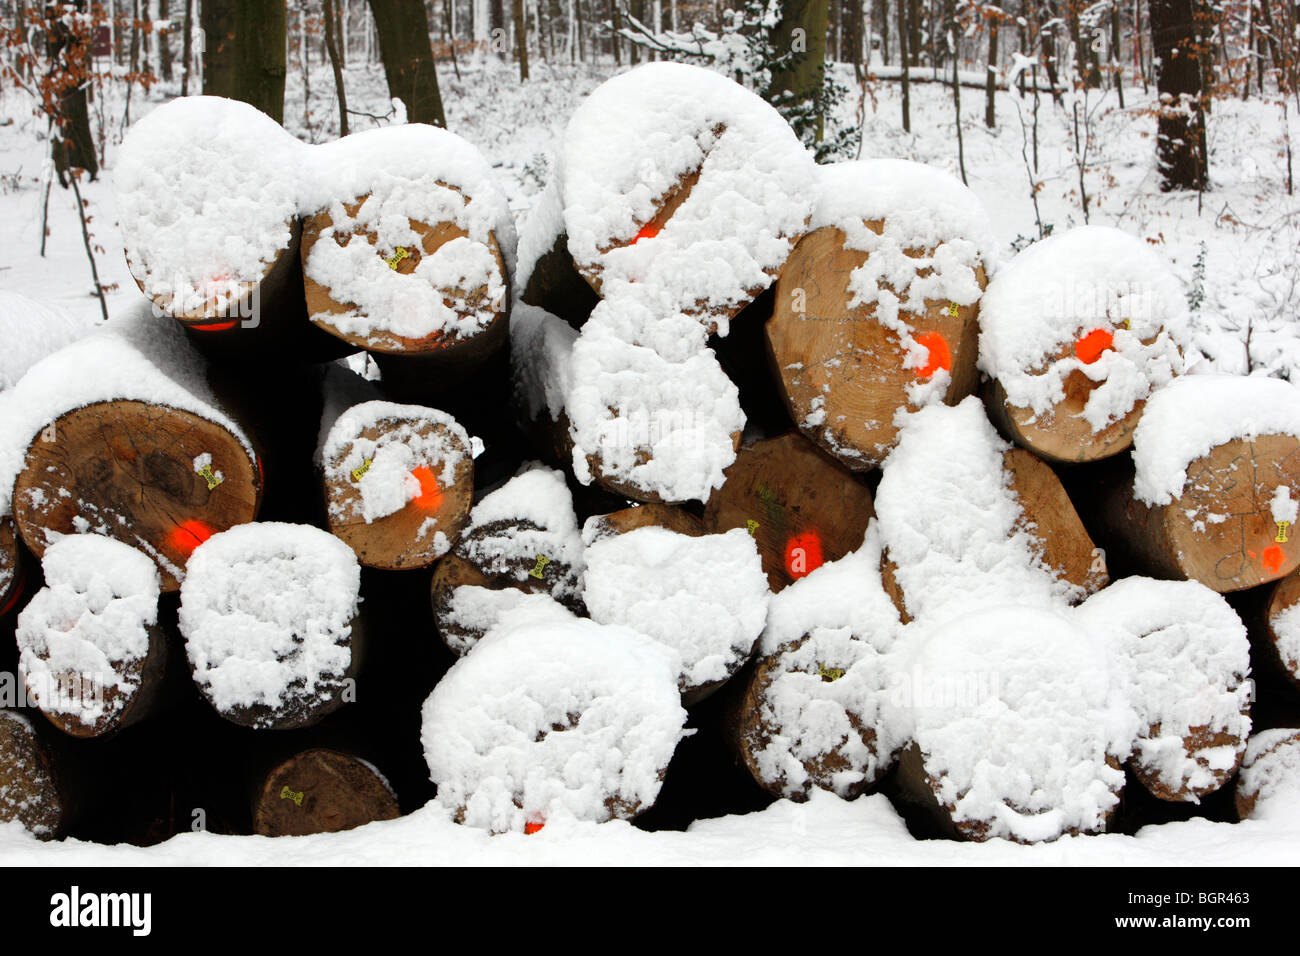 marked tree logs, winter, snow, Essen, NRW Germany - Stock Image